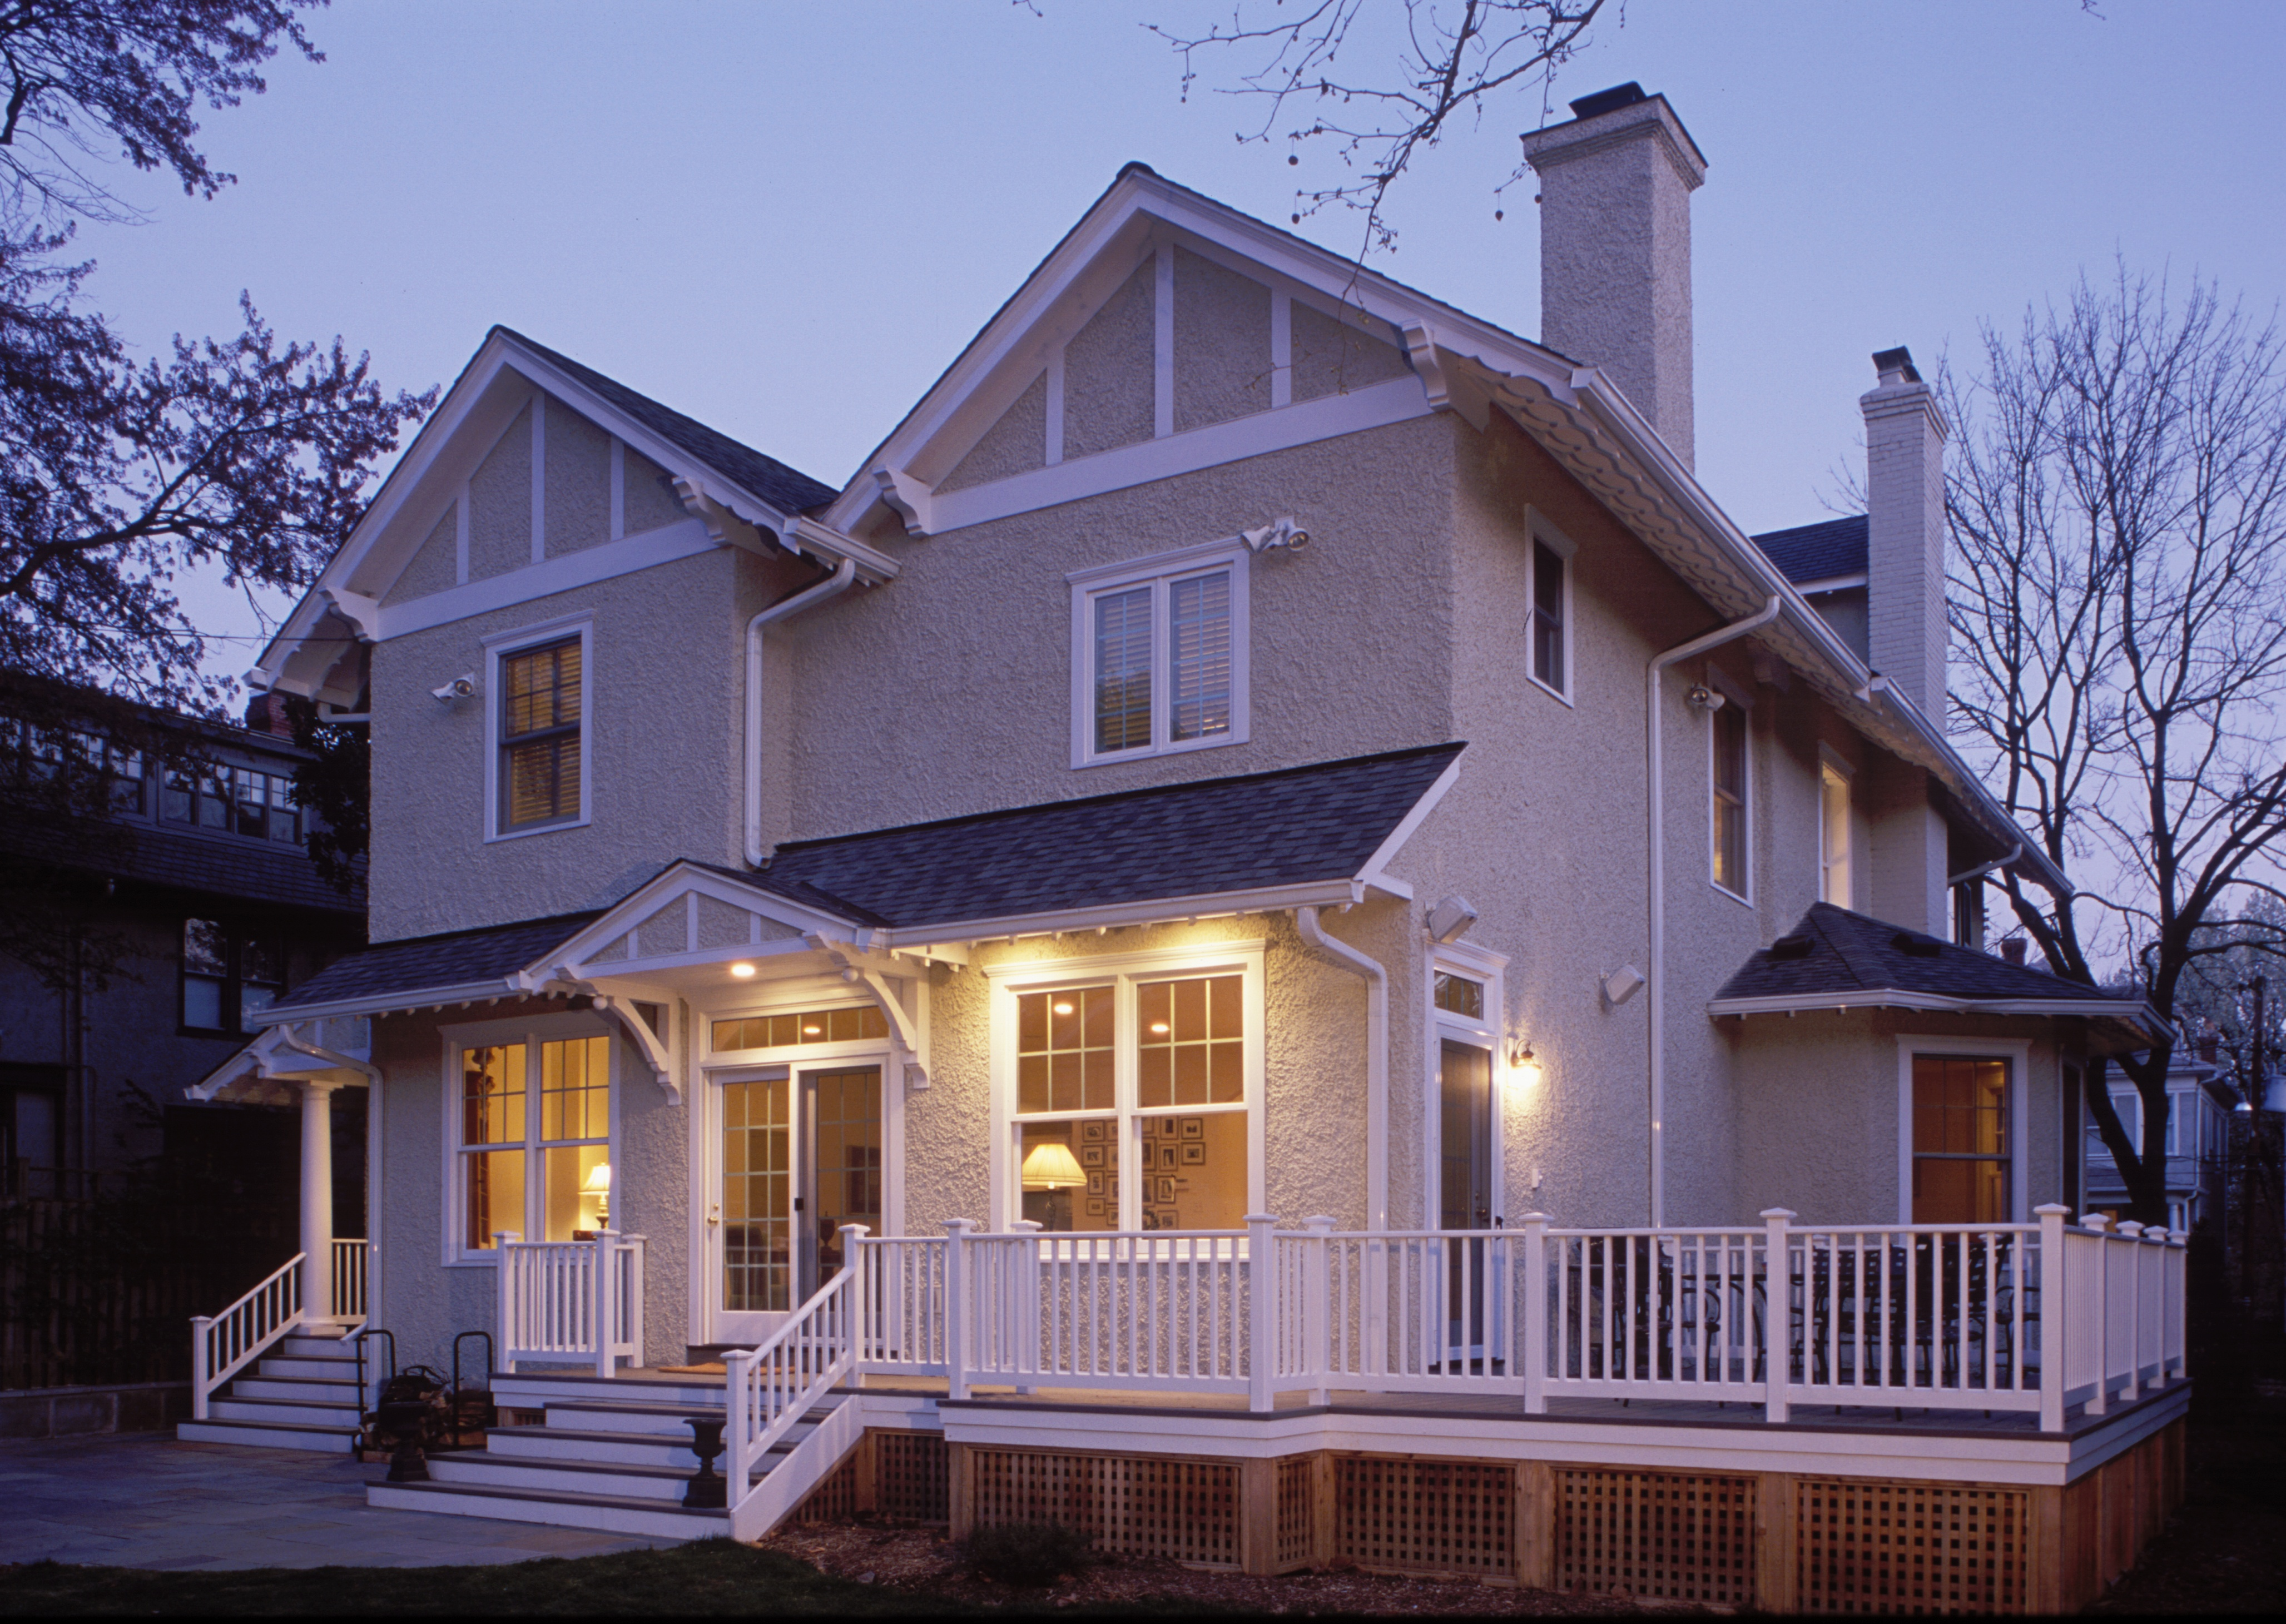 Renovated exterior